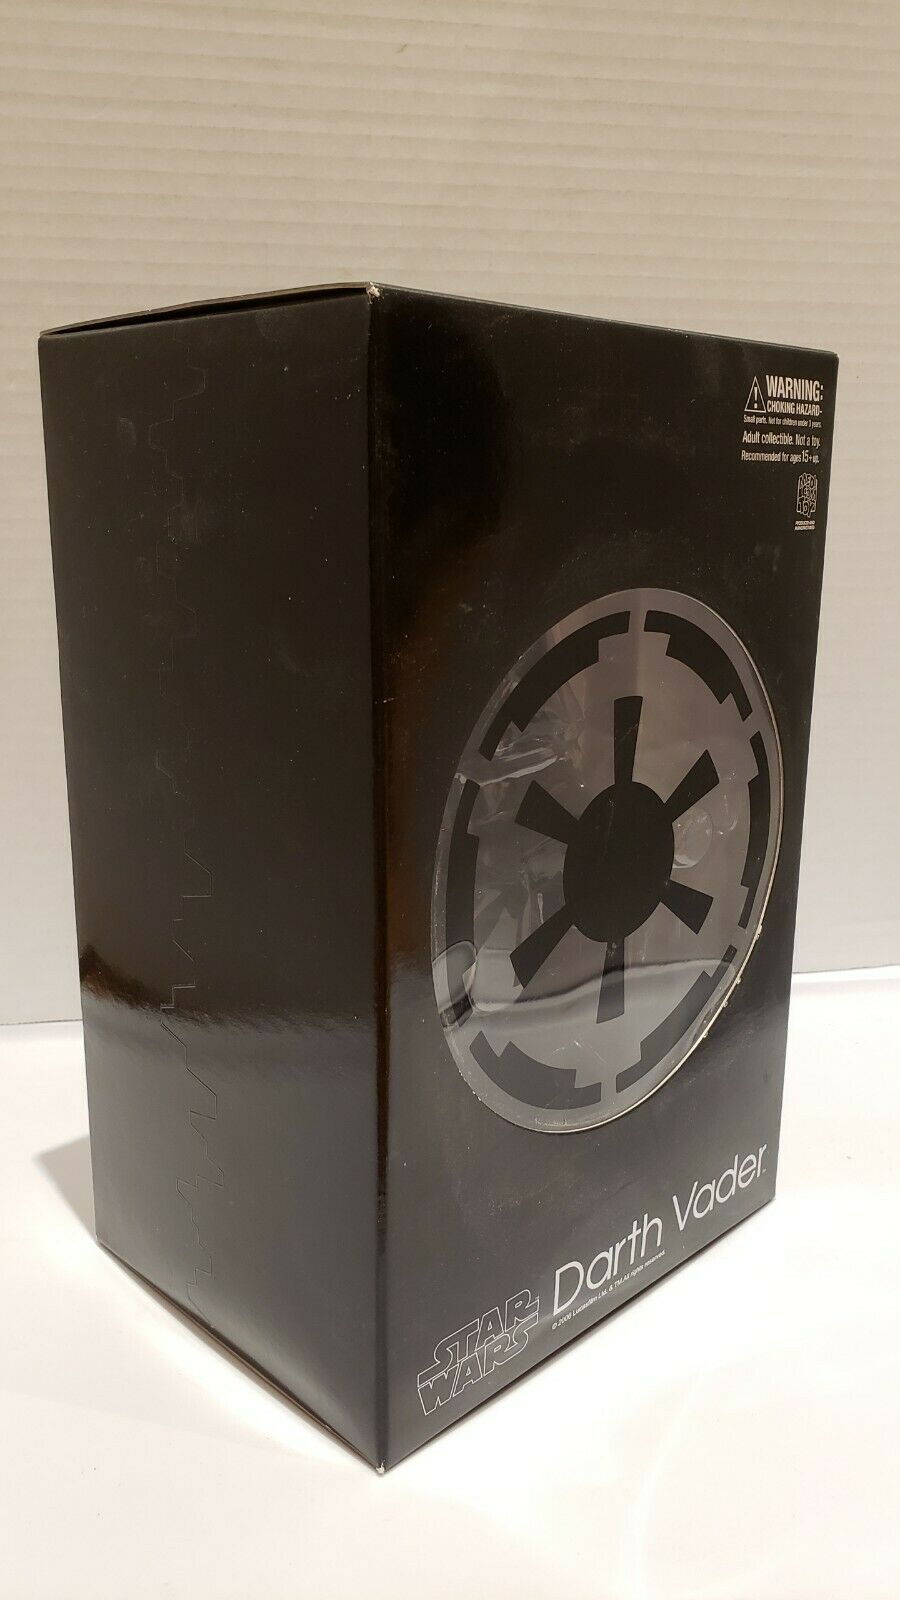 New Star Wars Medicom Toy Darth Vader 2006 Tomy Sideshow Vinyl Figure on eBay thumbnail